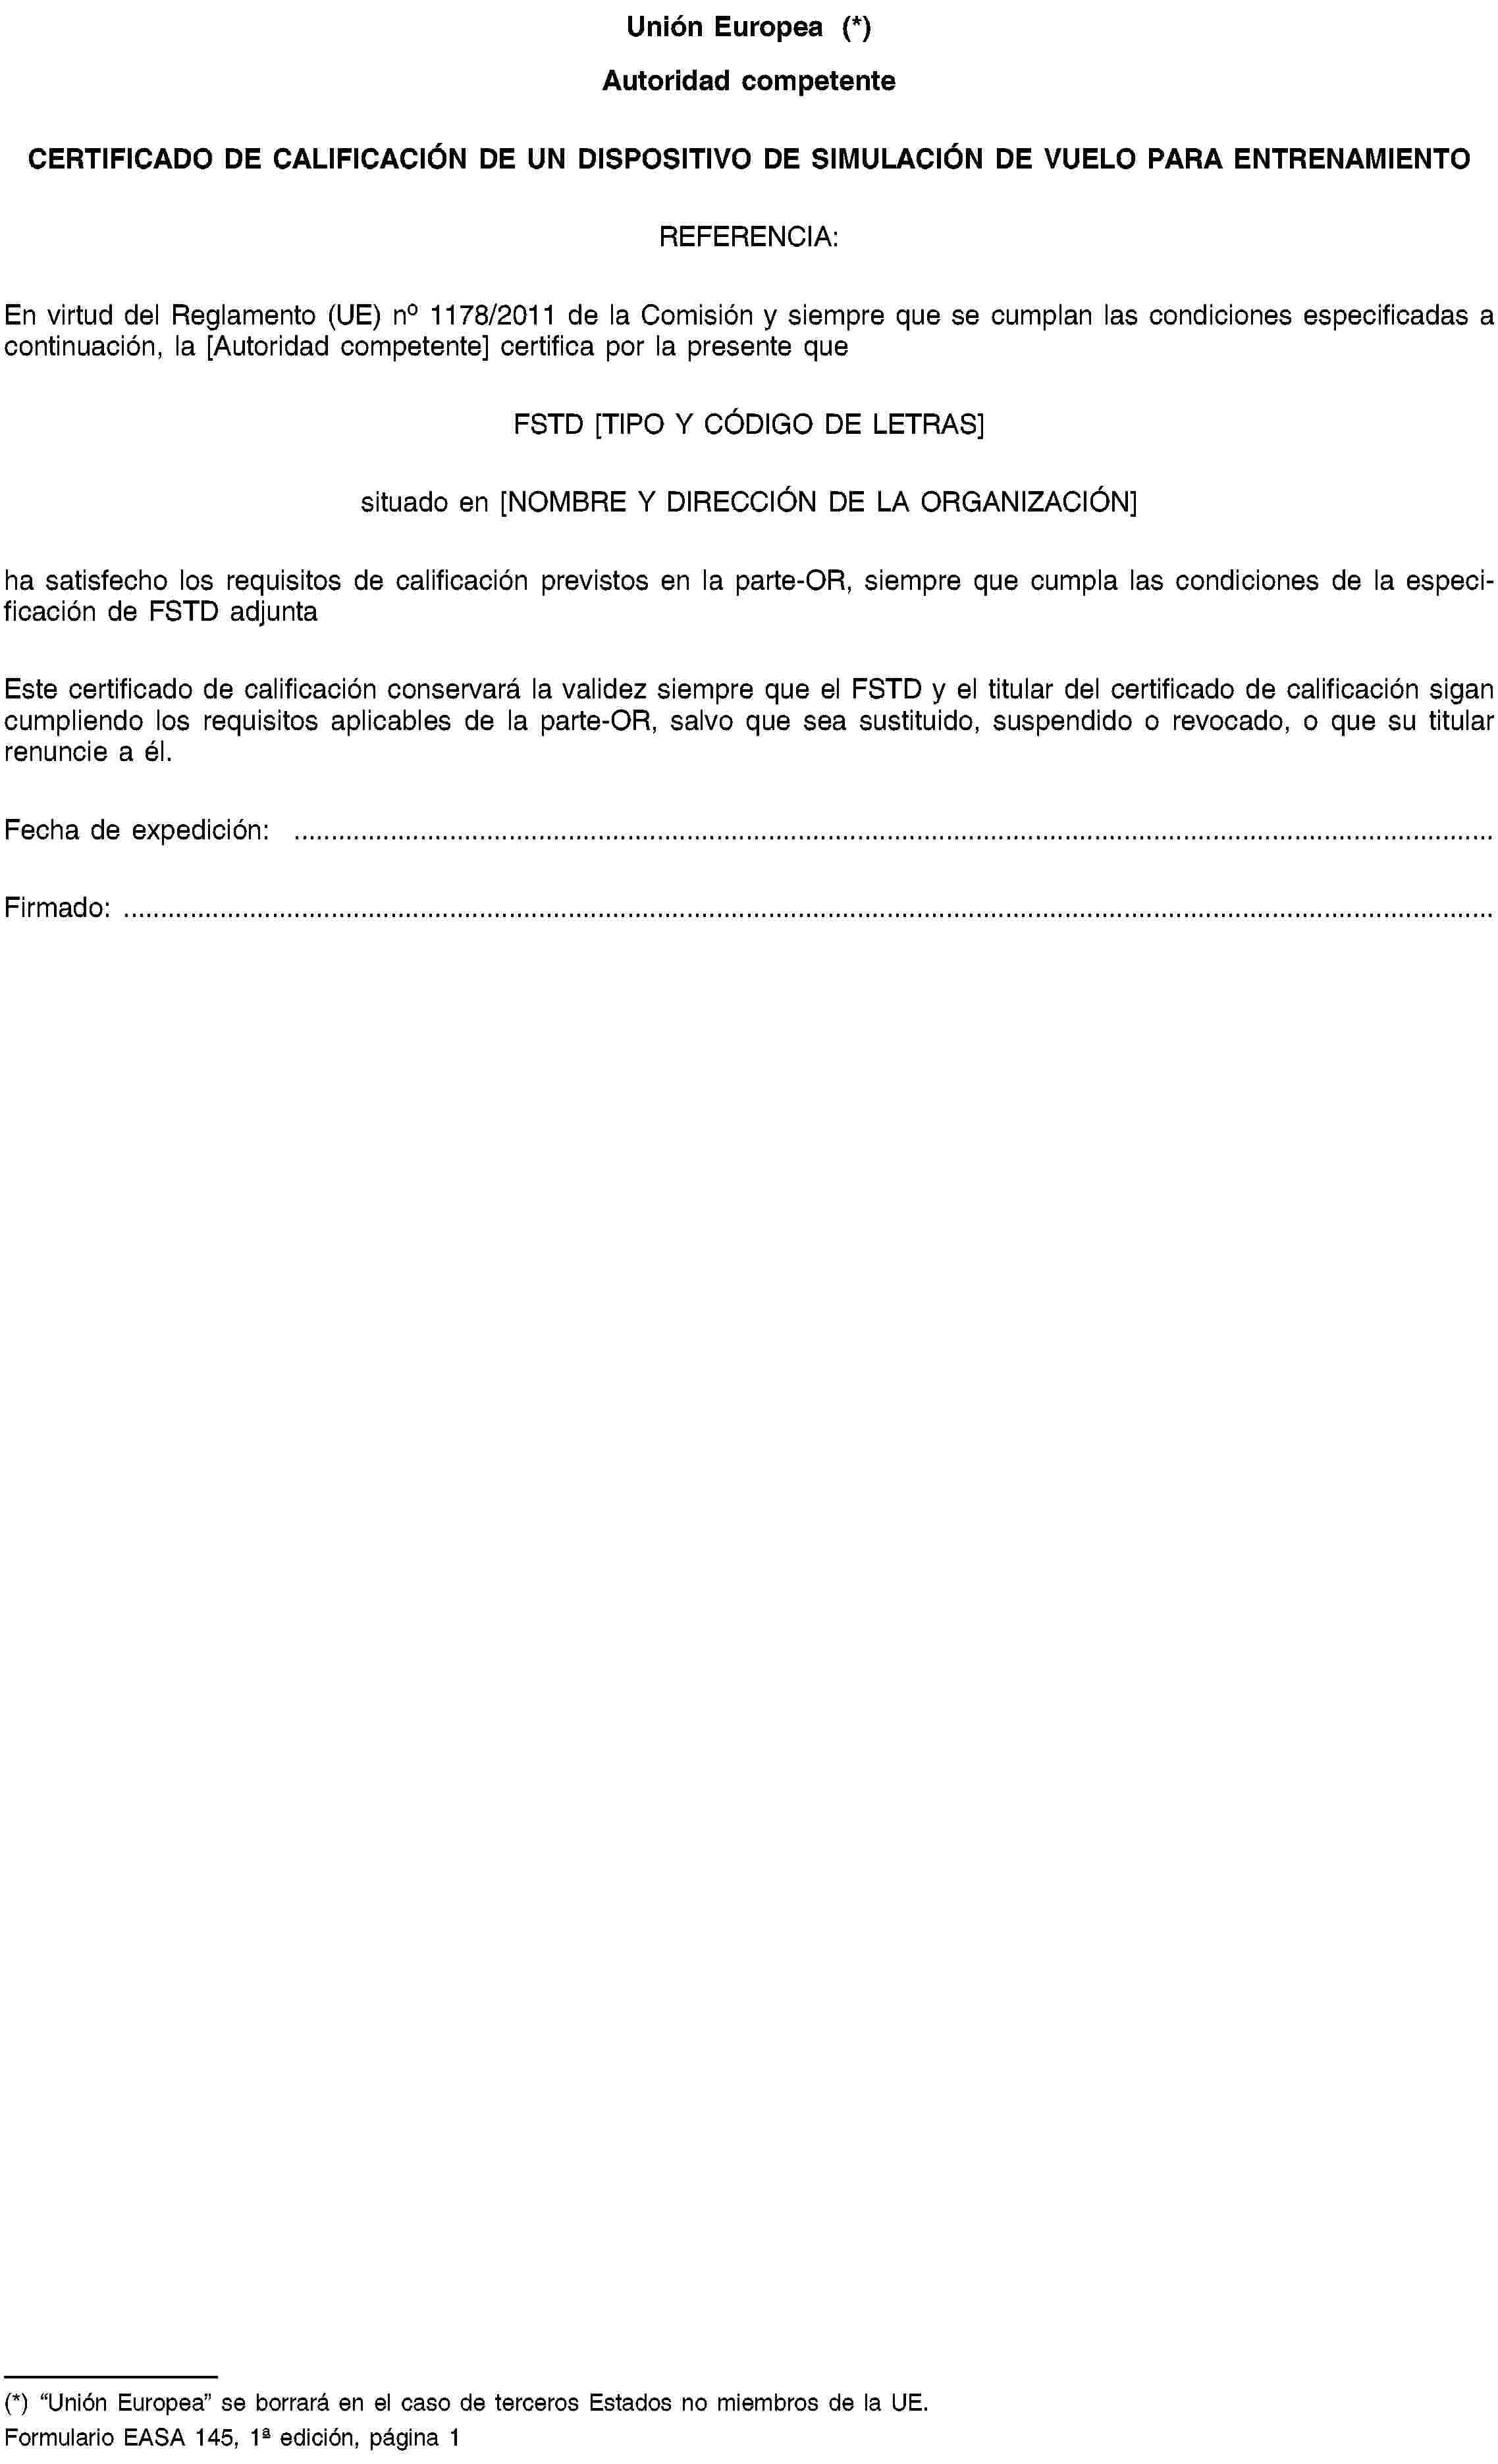 EUR-Lex - 02011R1178-20140403 - EN - EUR-Lex